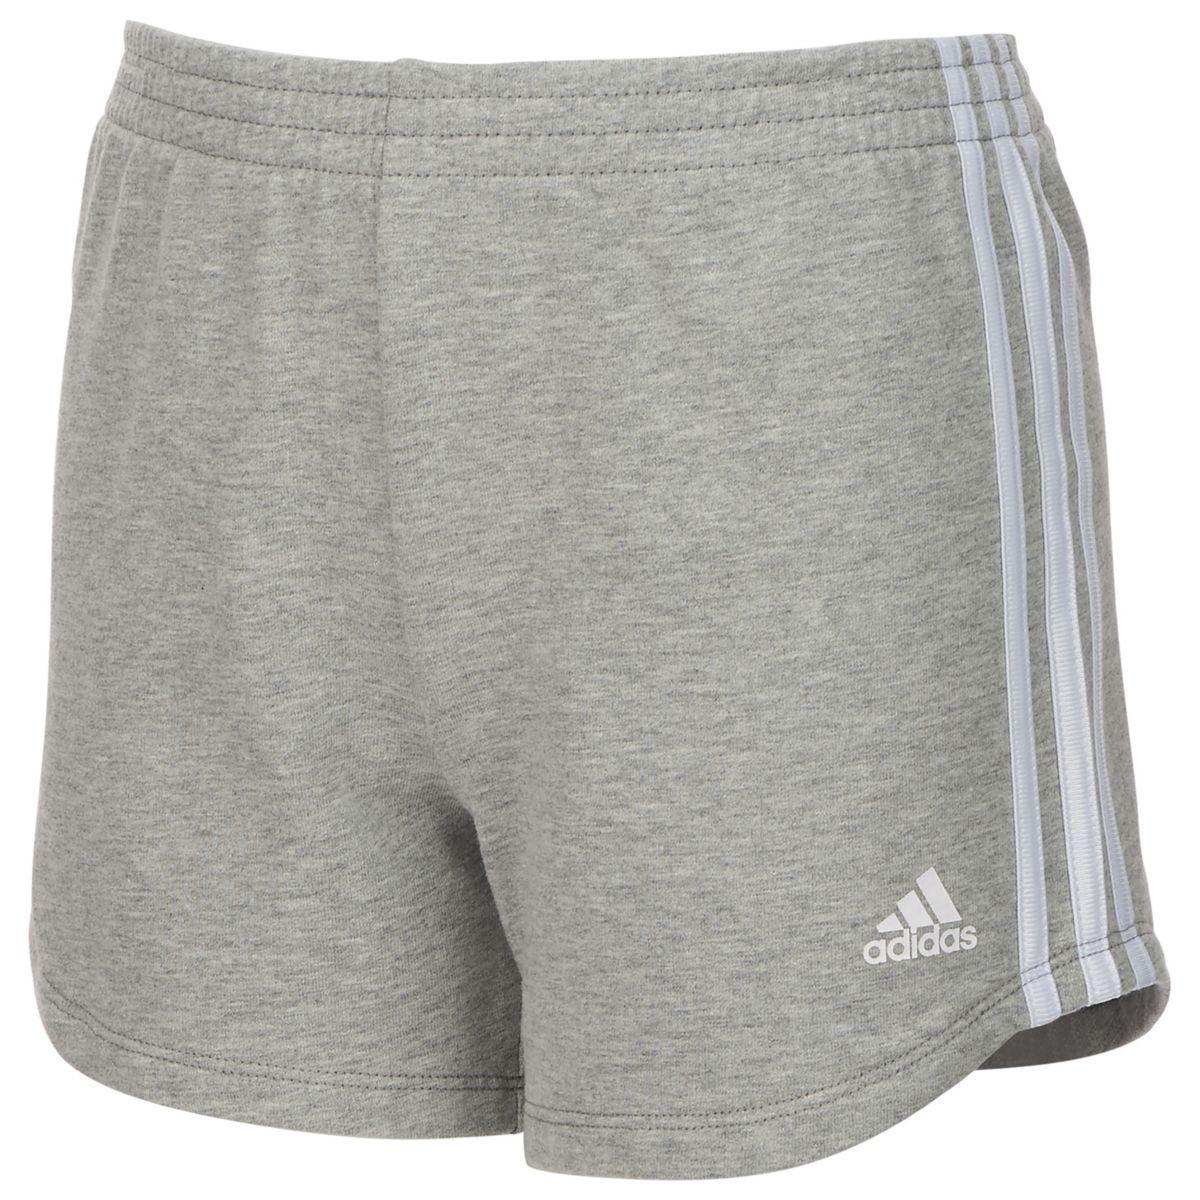 Adidas Big Girls' Sport Shorts - Black, M